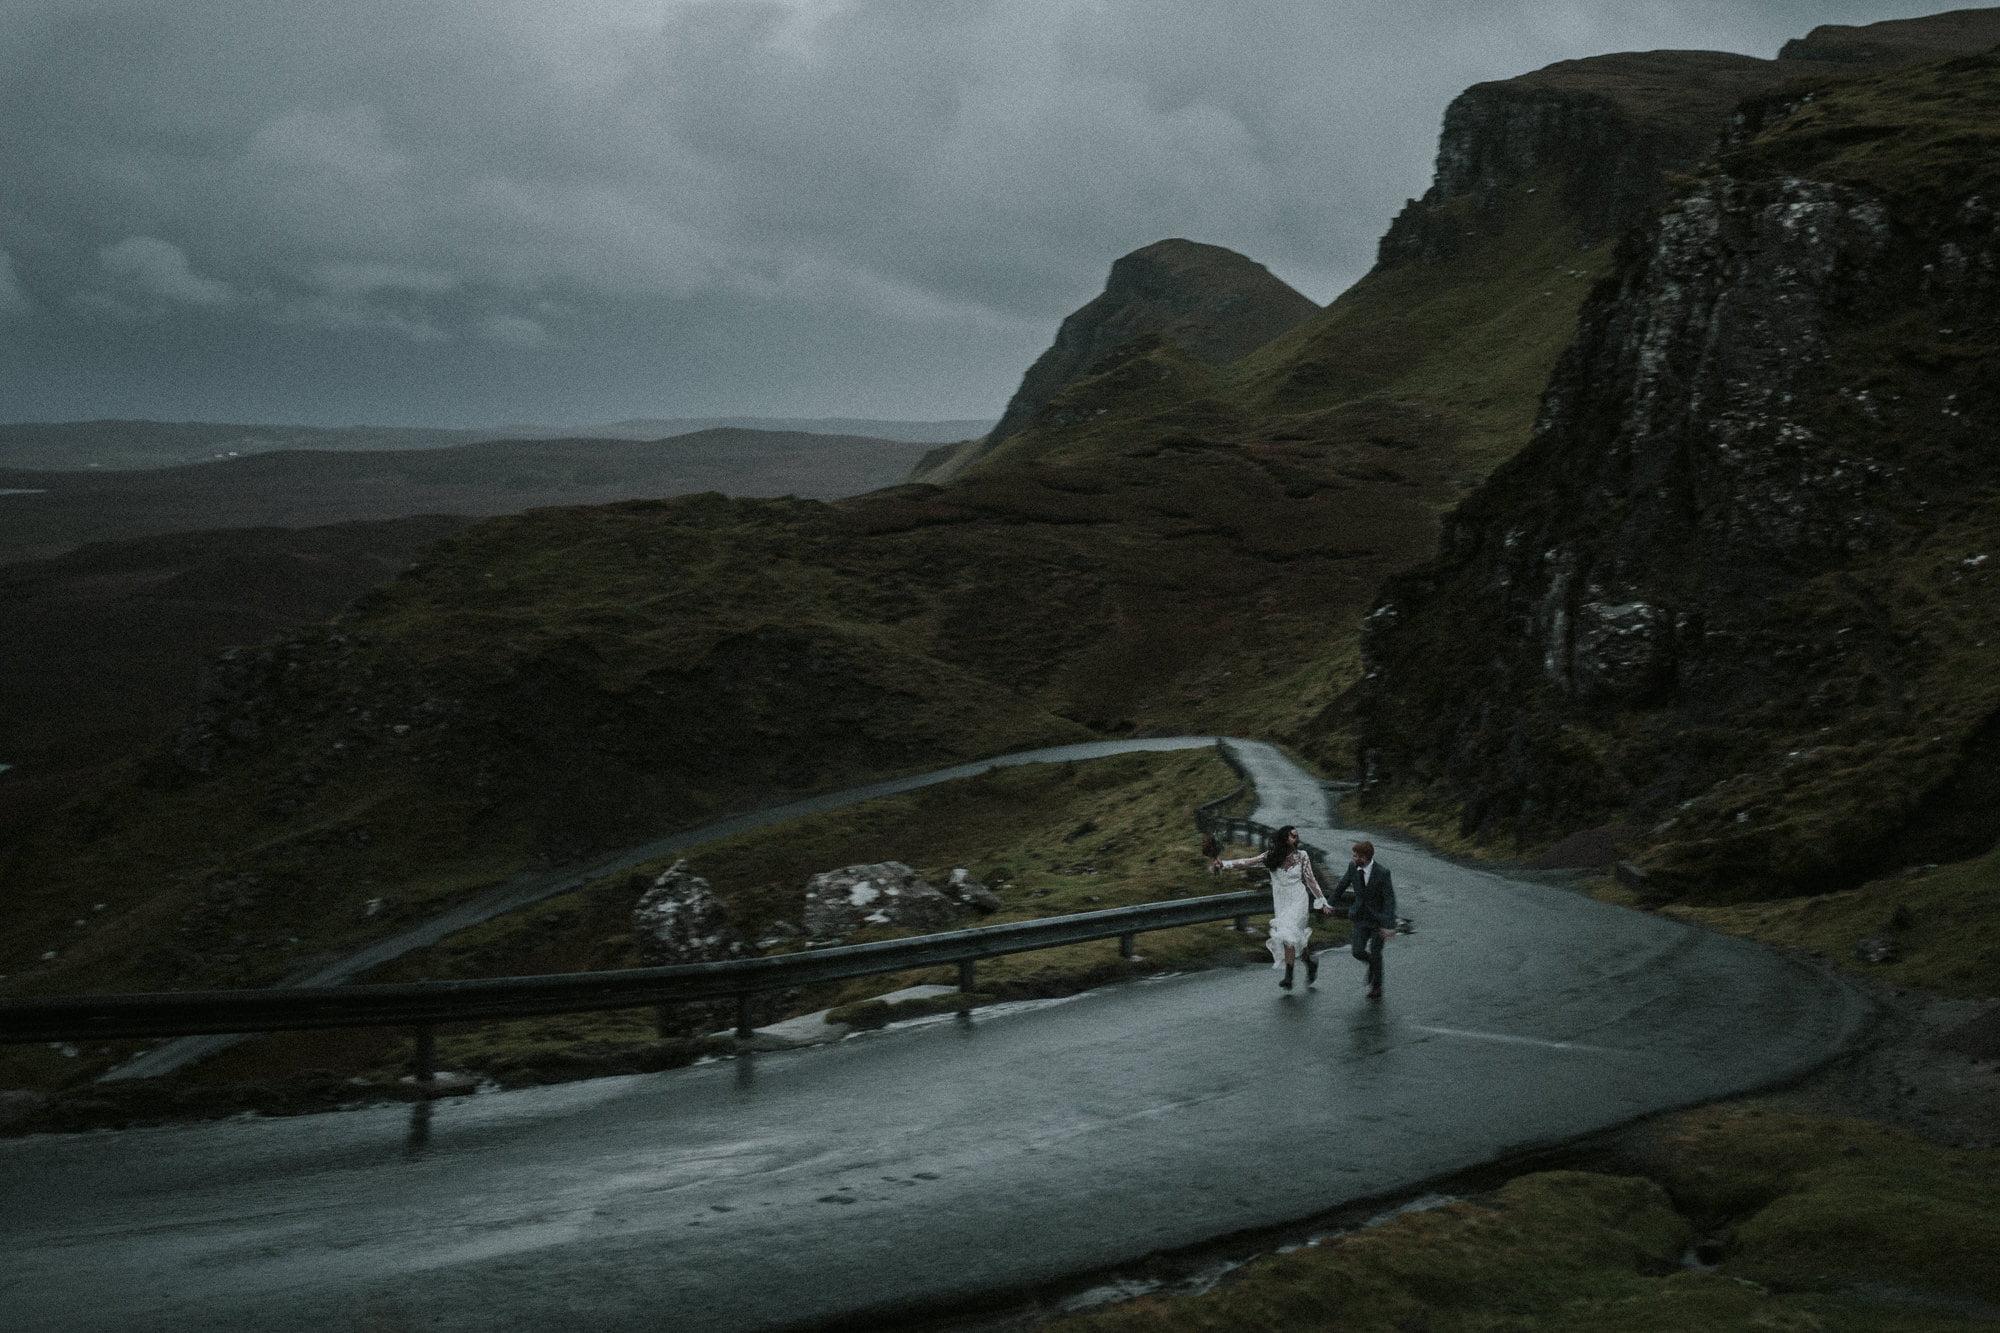 Wedding Photographer in Fife Scotland, Isle of Skye Elopement Photographer, Sligachan Isle of Skye Elopement, The Quiraing Isle of Skye Elopement, the best locations to elope Isle of Skye,